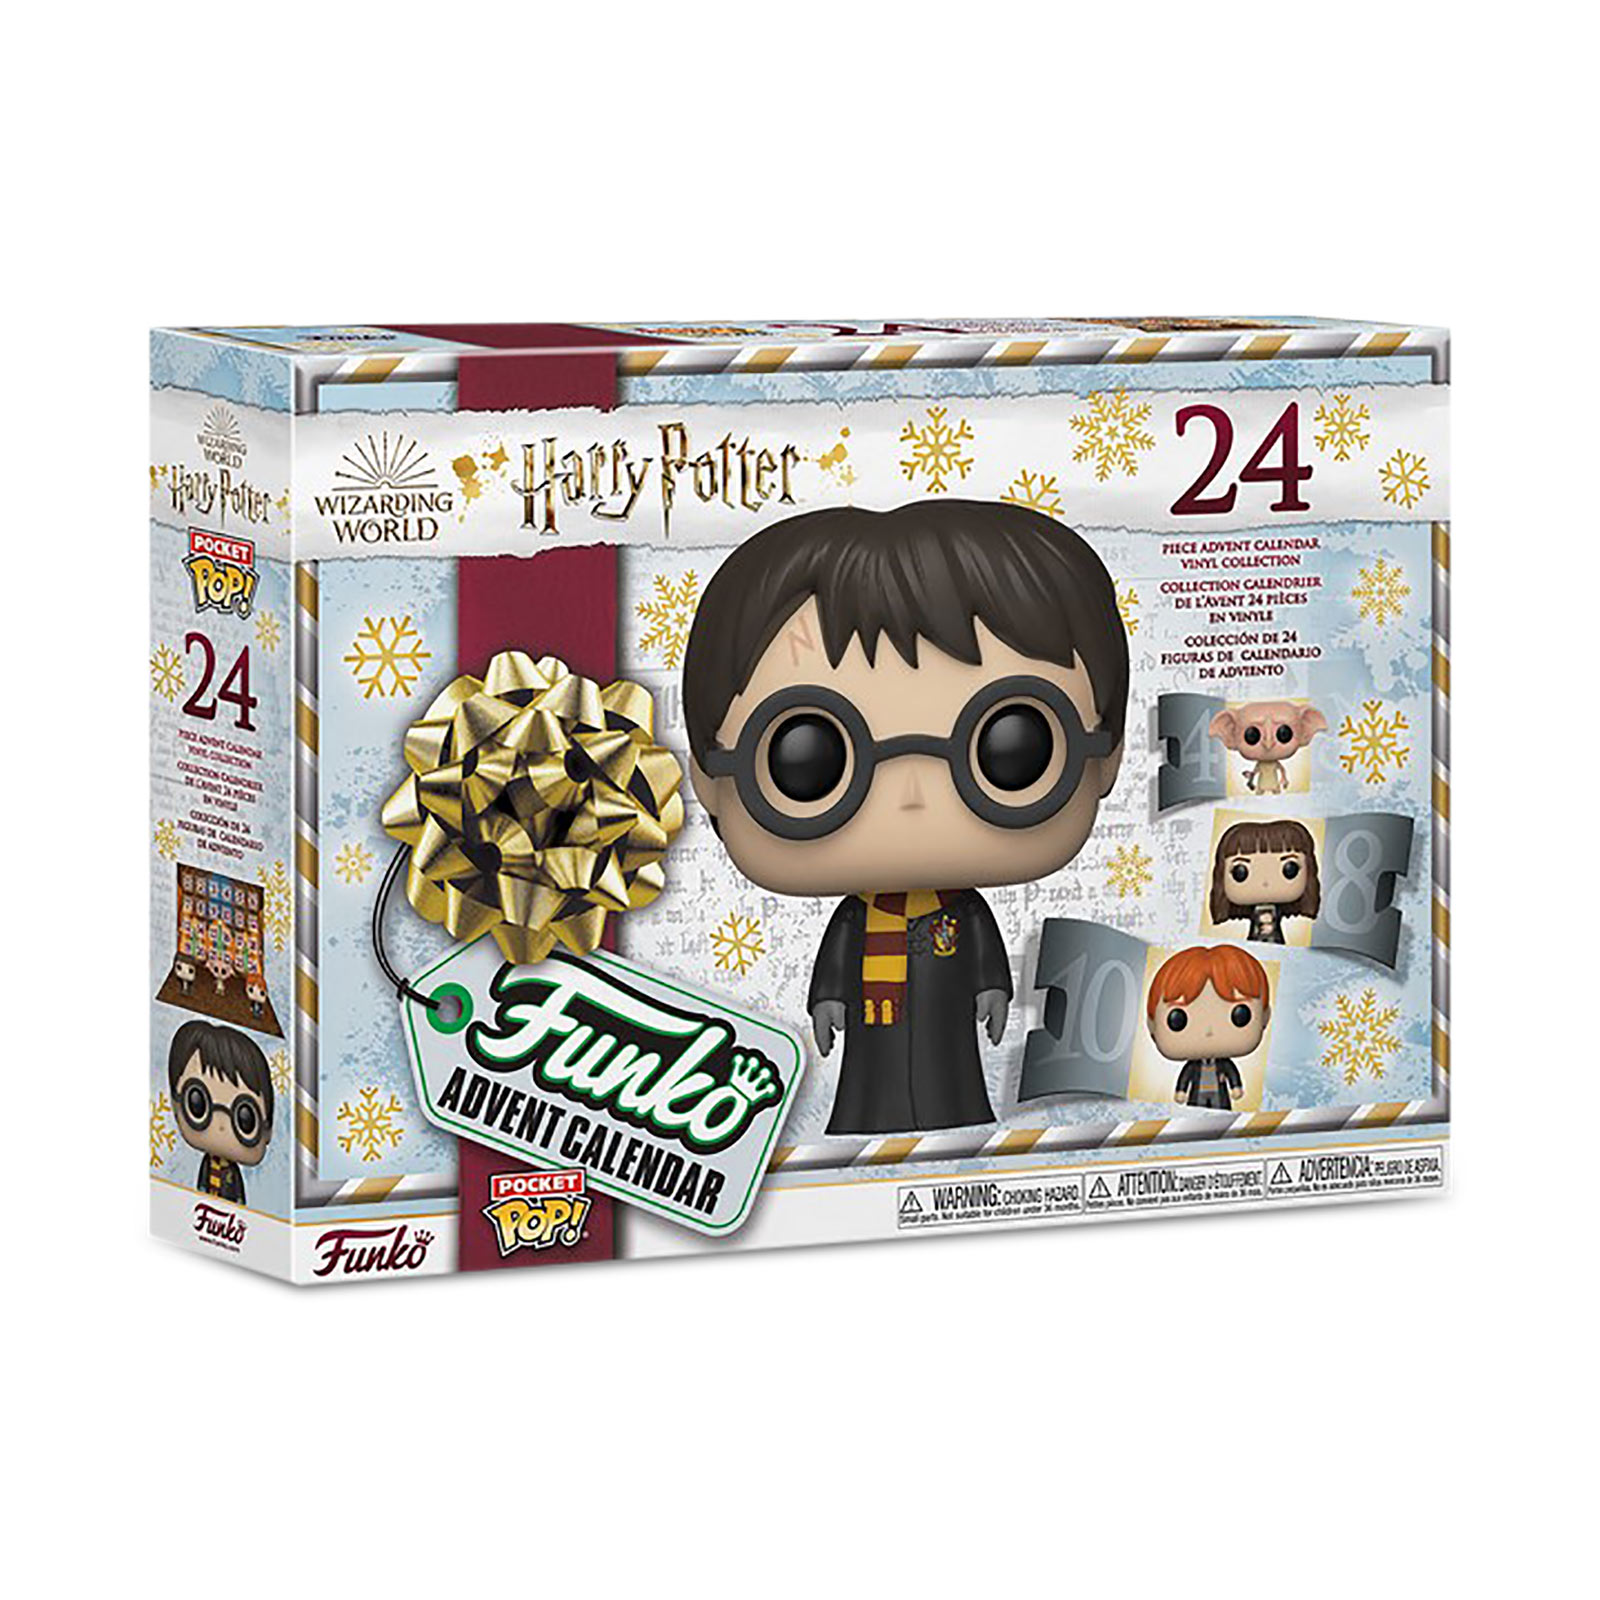 Harry Potter - Funko Pocket Pop Adventskalender 2021